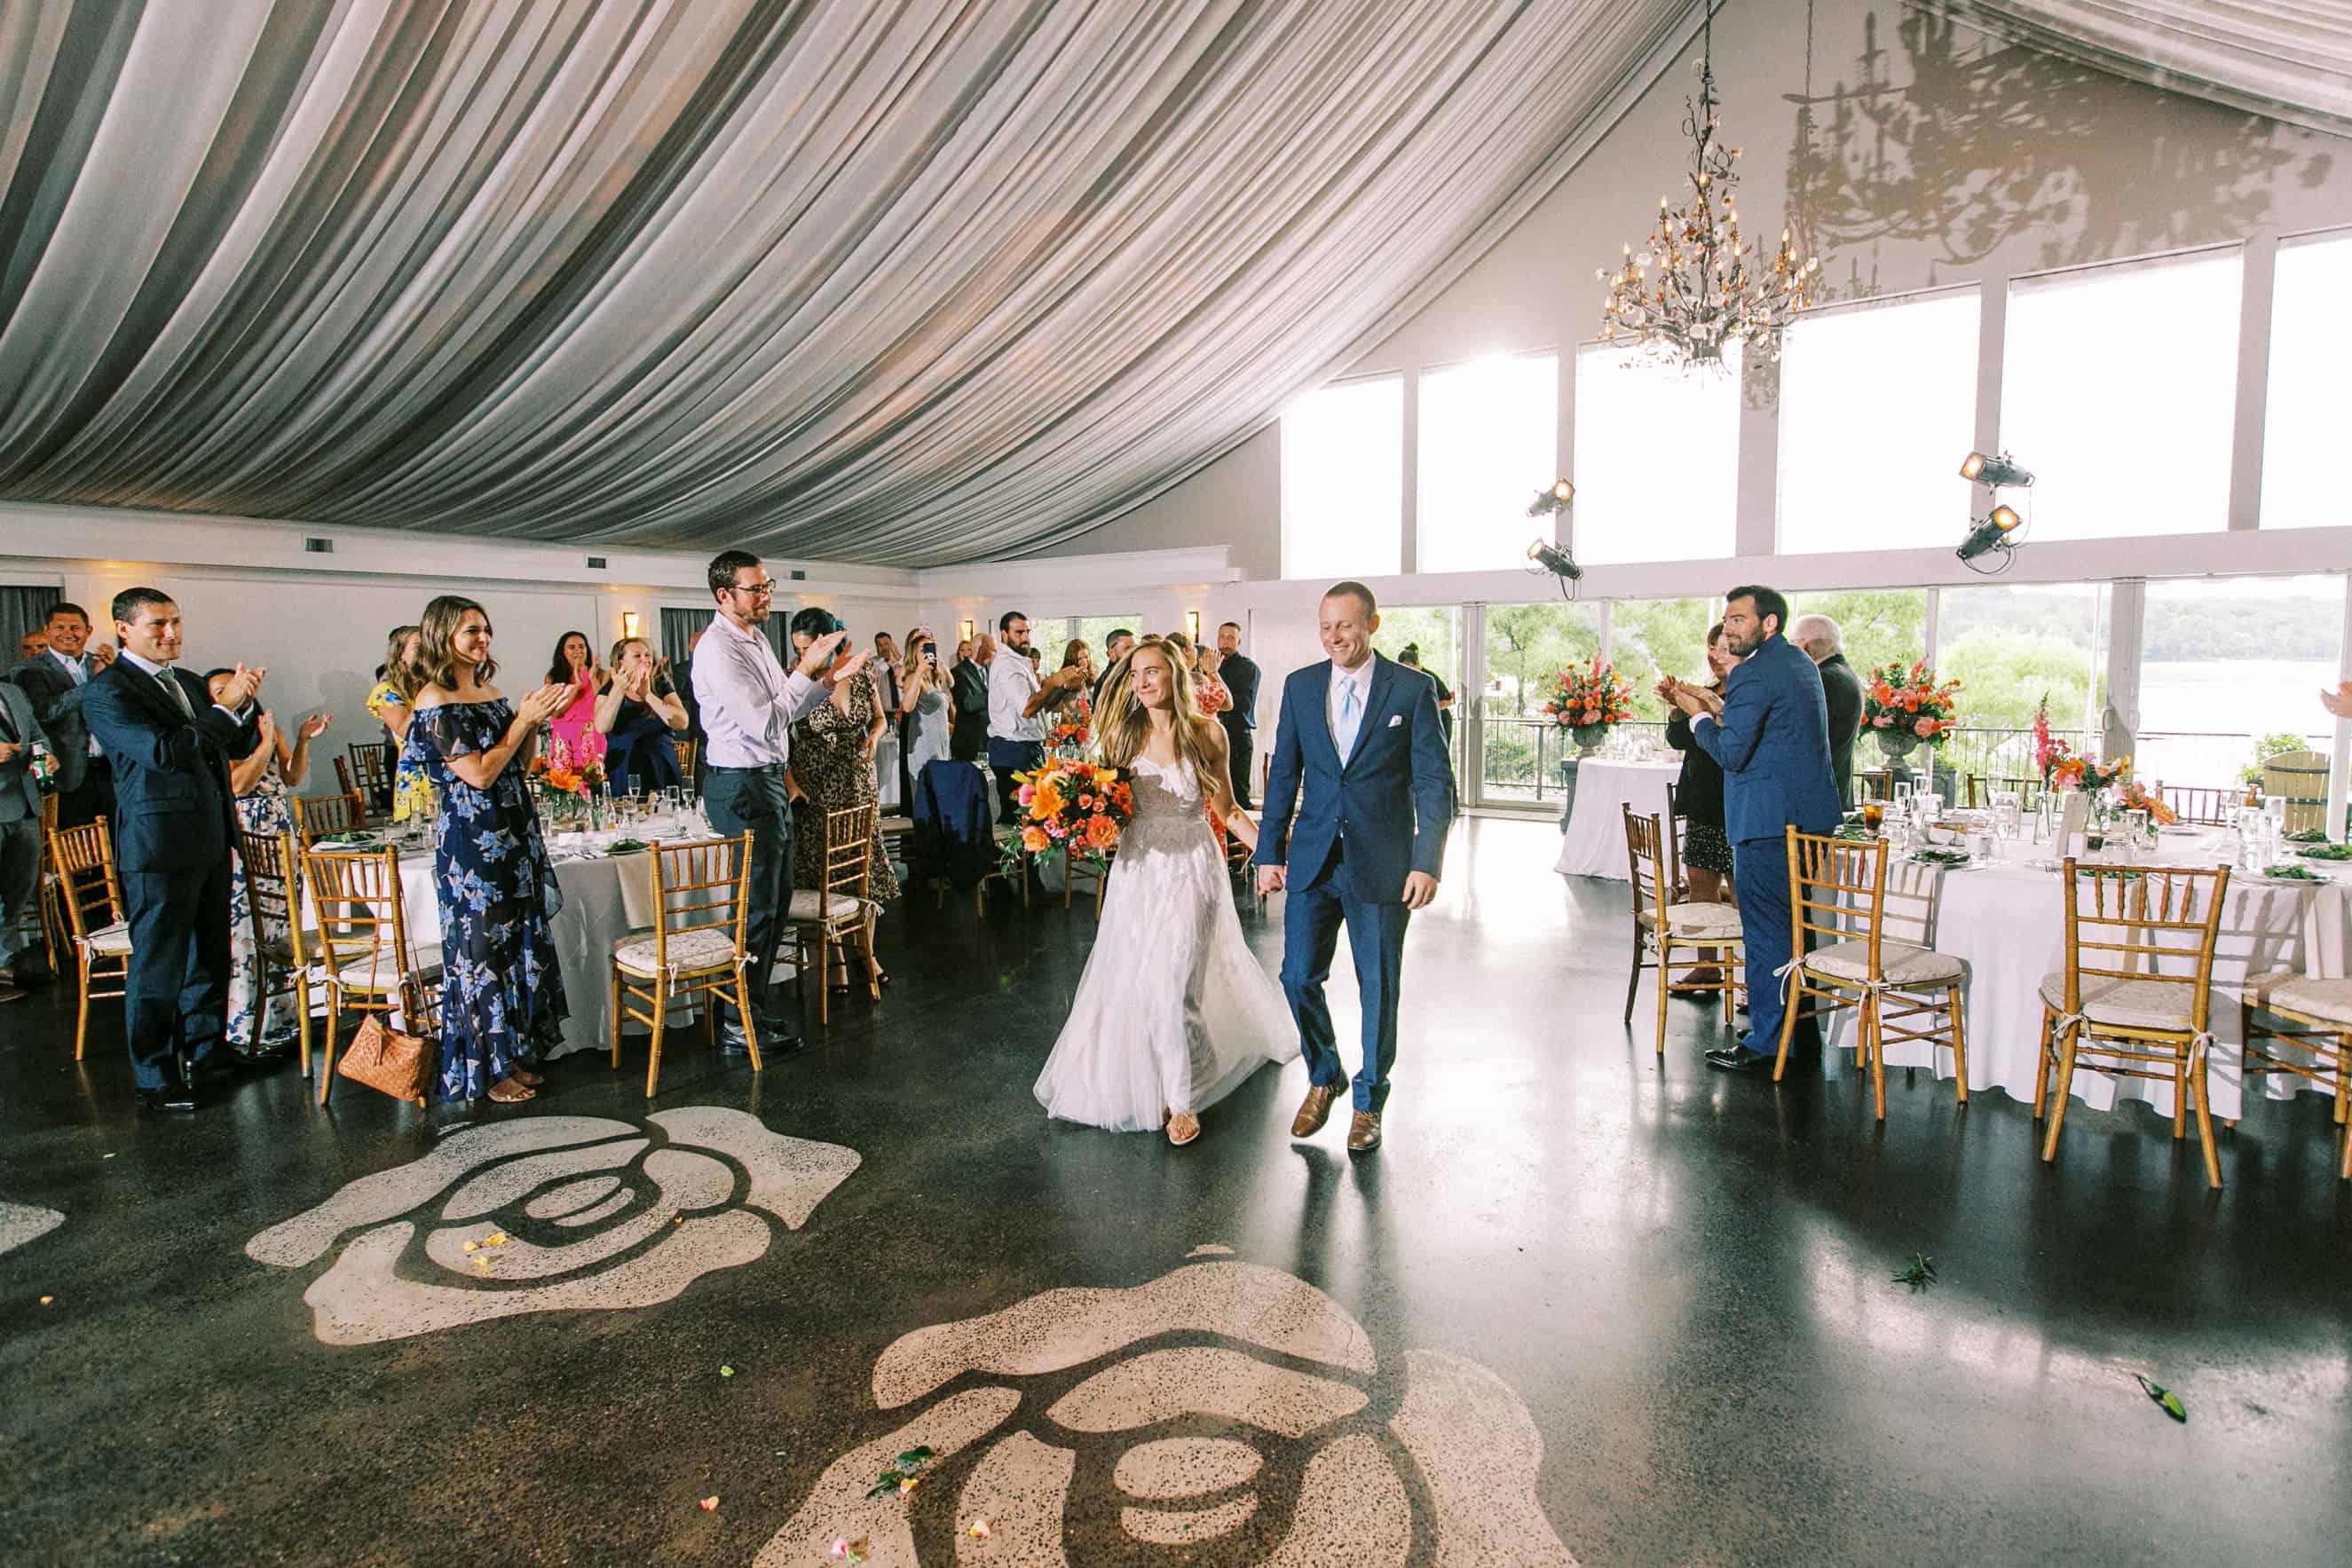 Wedding Reception The Lake House Inn